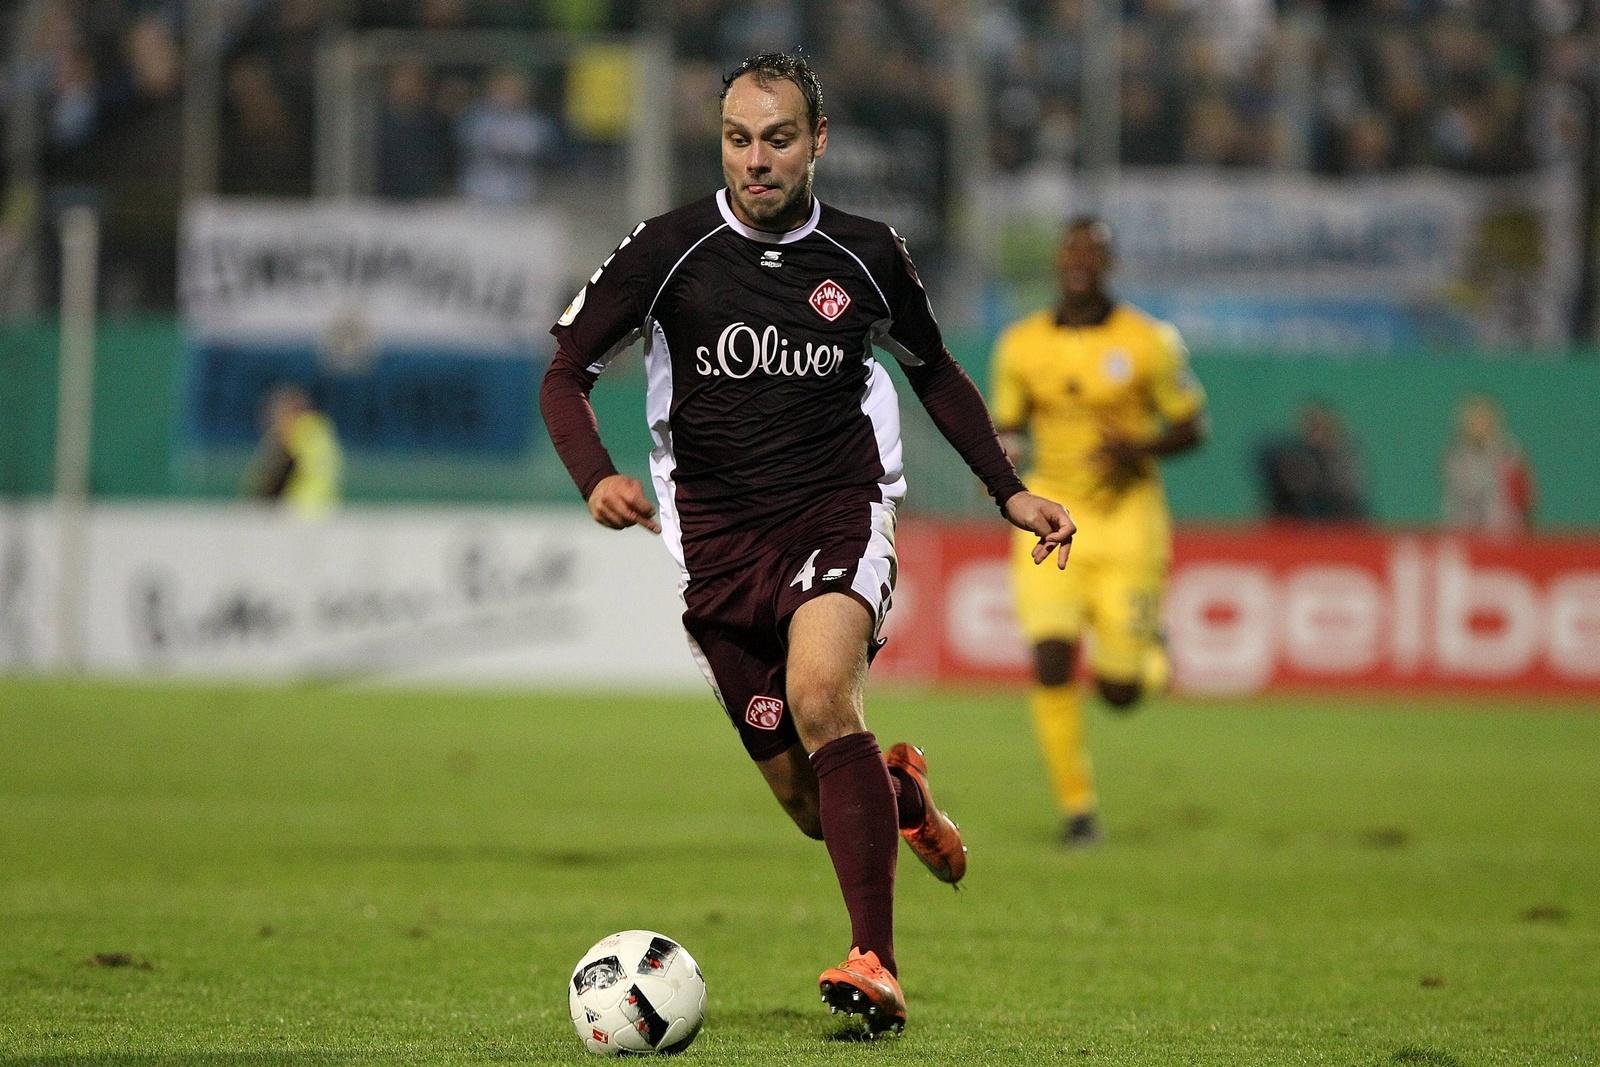 Rico Benatelli von den Würzburger Kickers